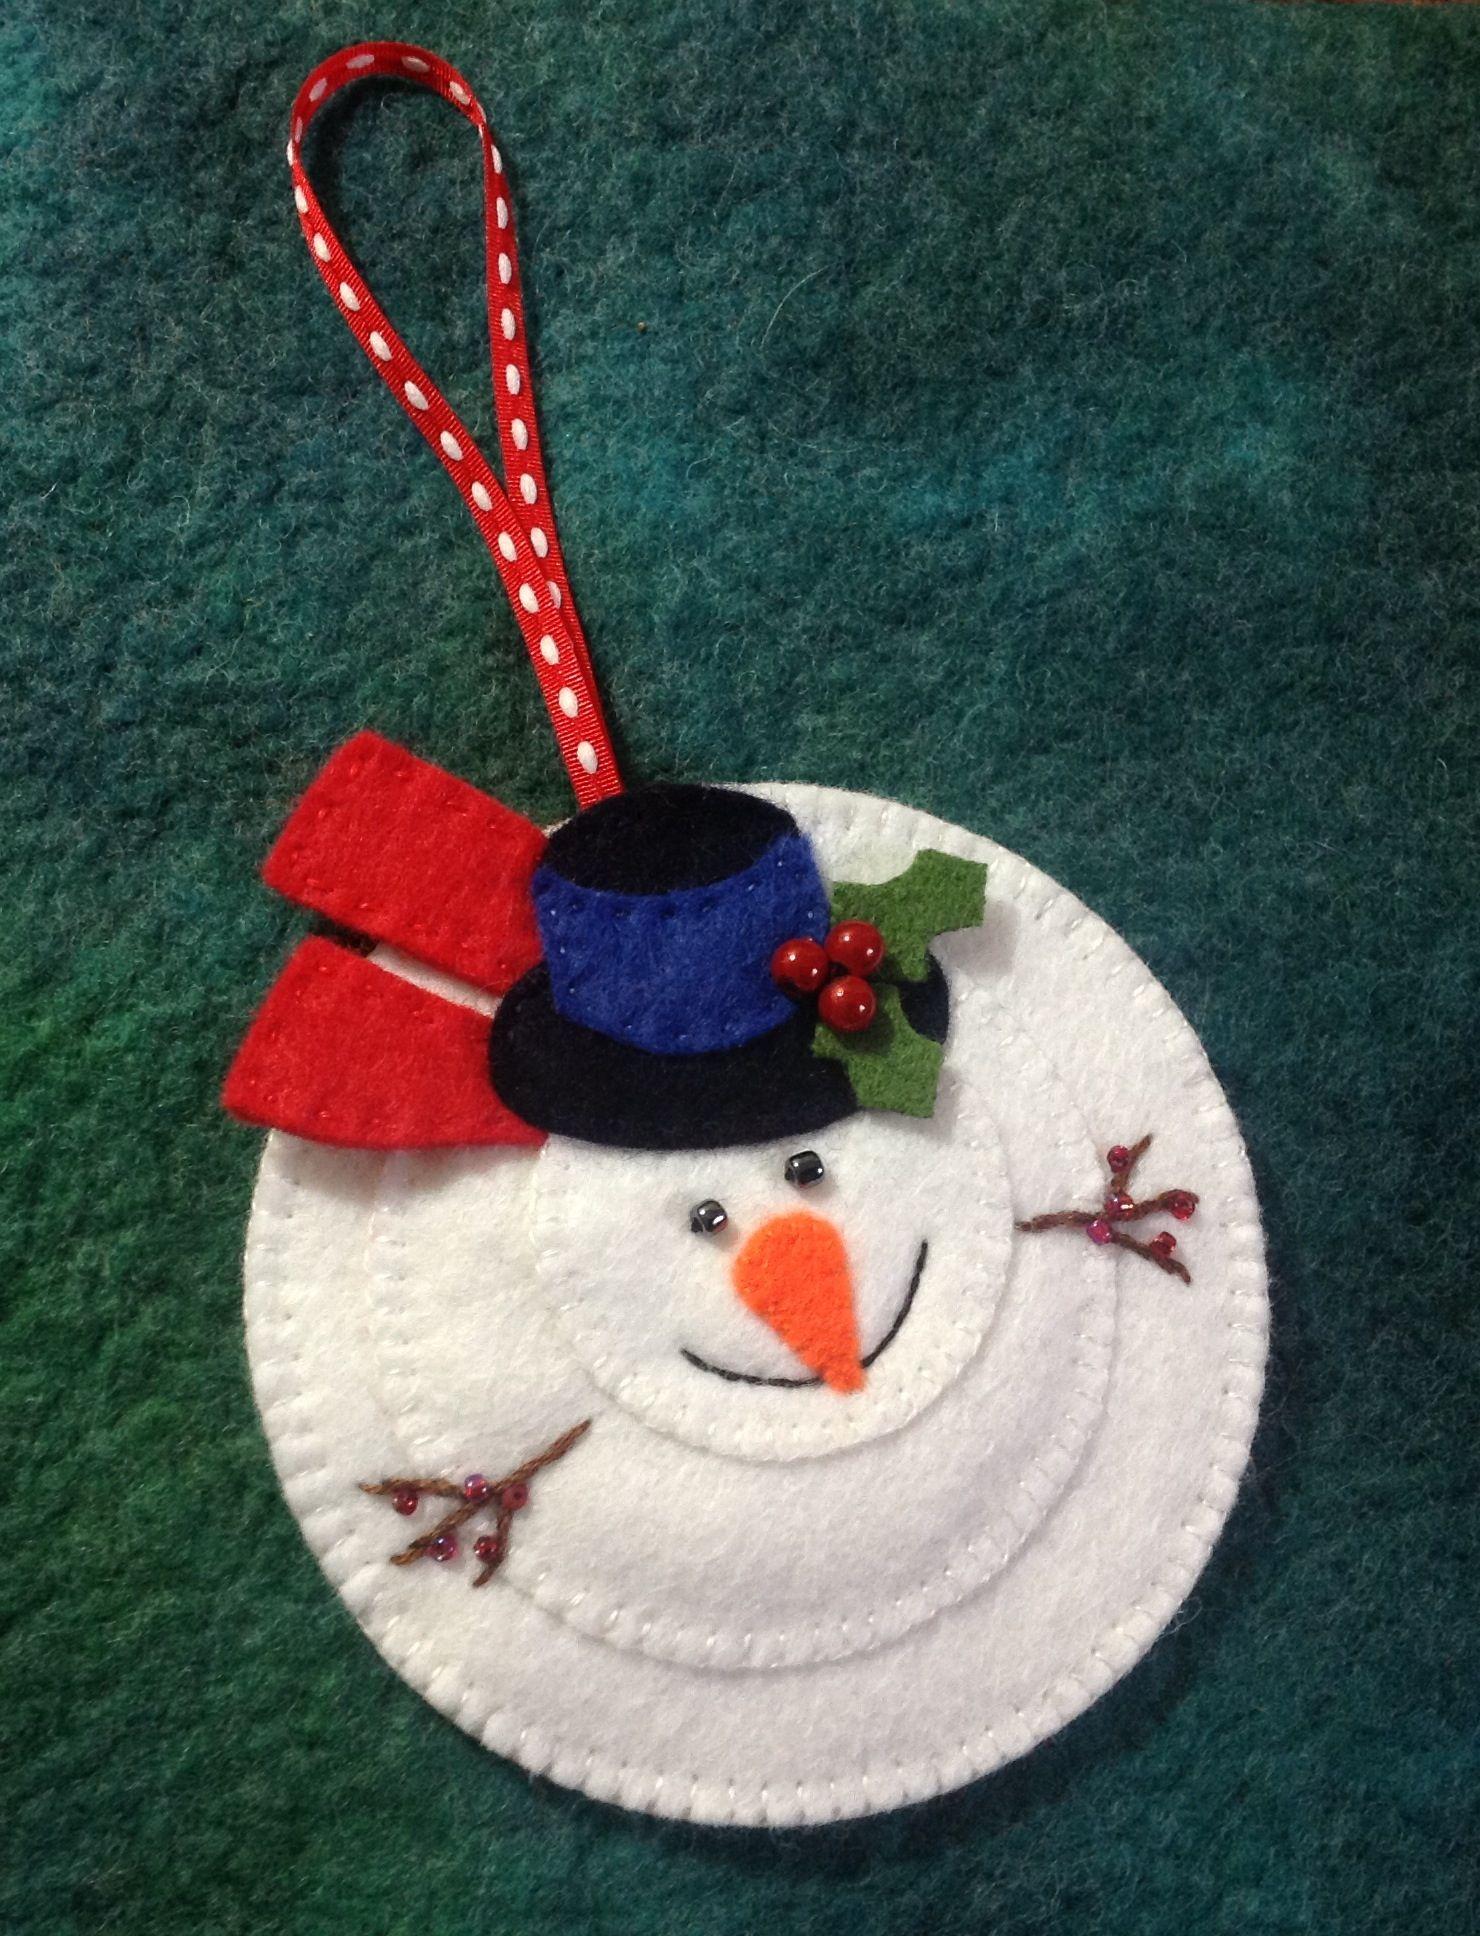 Felt Snowman Christmas Hanging Ornament Felt Crafts Christmas Felt Christmas Ornaments Christmas Crafts